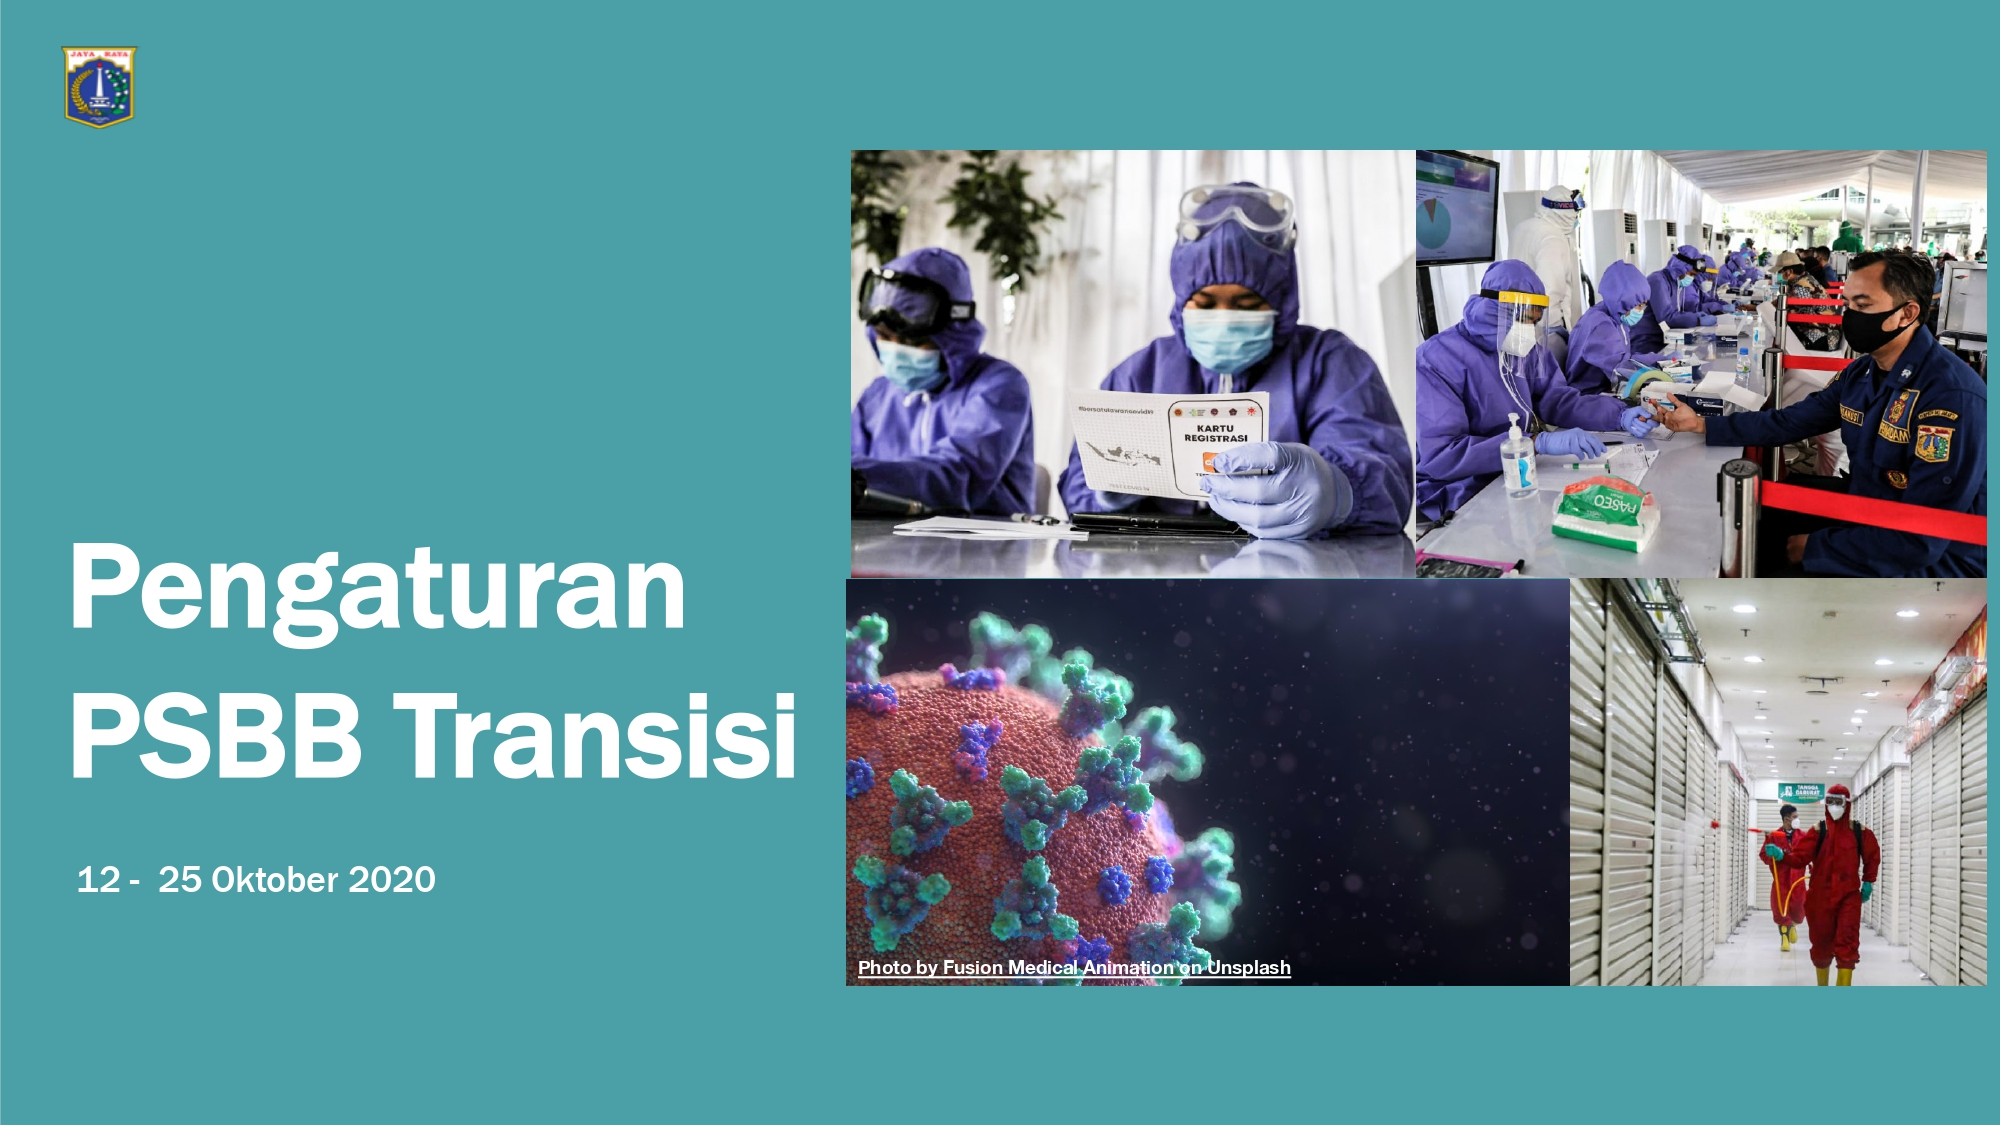 Pengaturan PSBB Transisi DKI Jakarta 12-25 Oktober 2020_page-0001